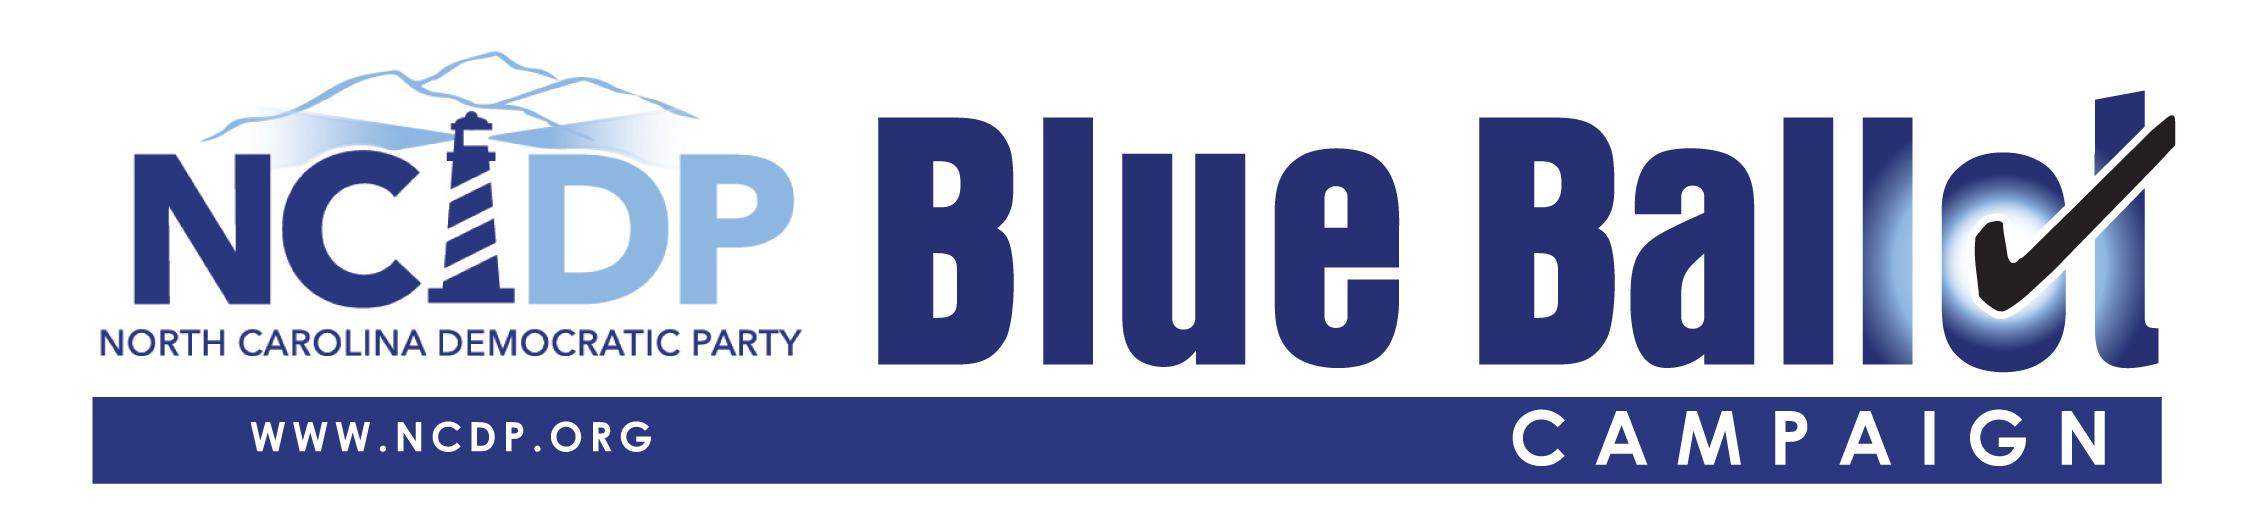 BlueBallot_CLR_BANNER_(1).jpg